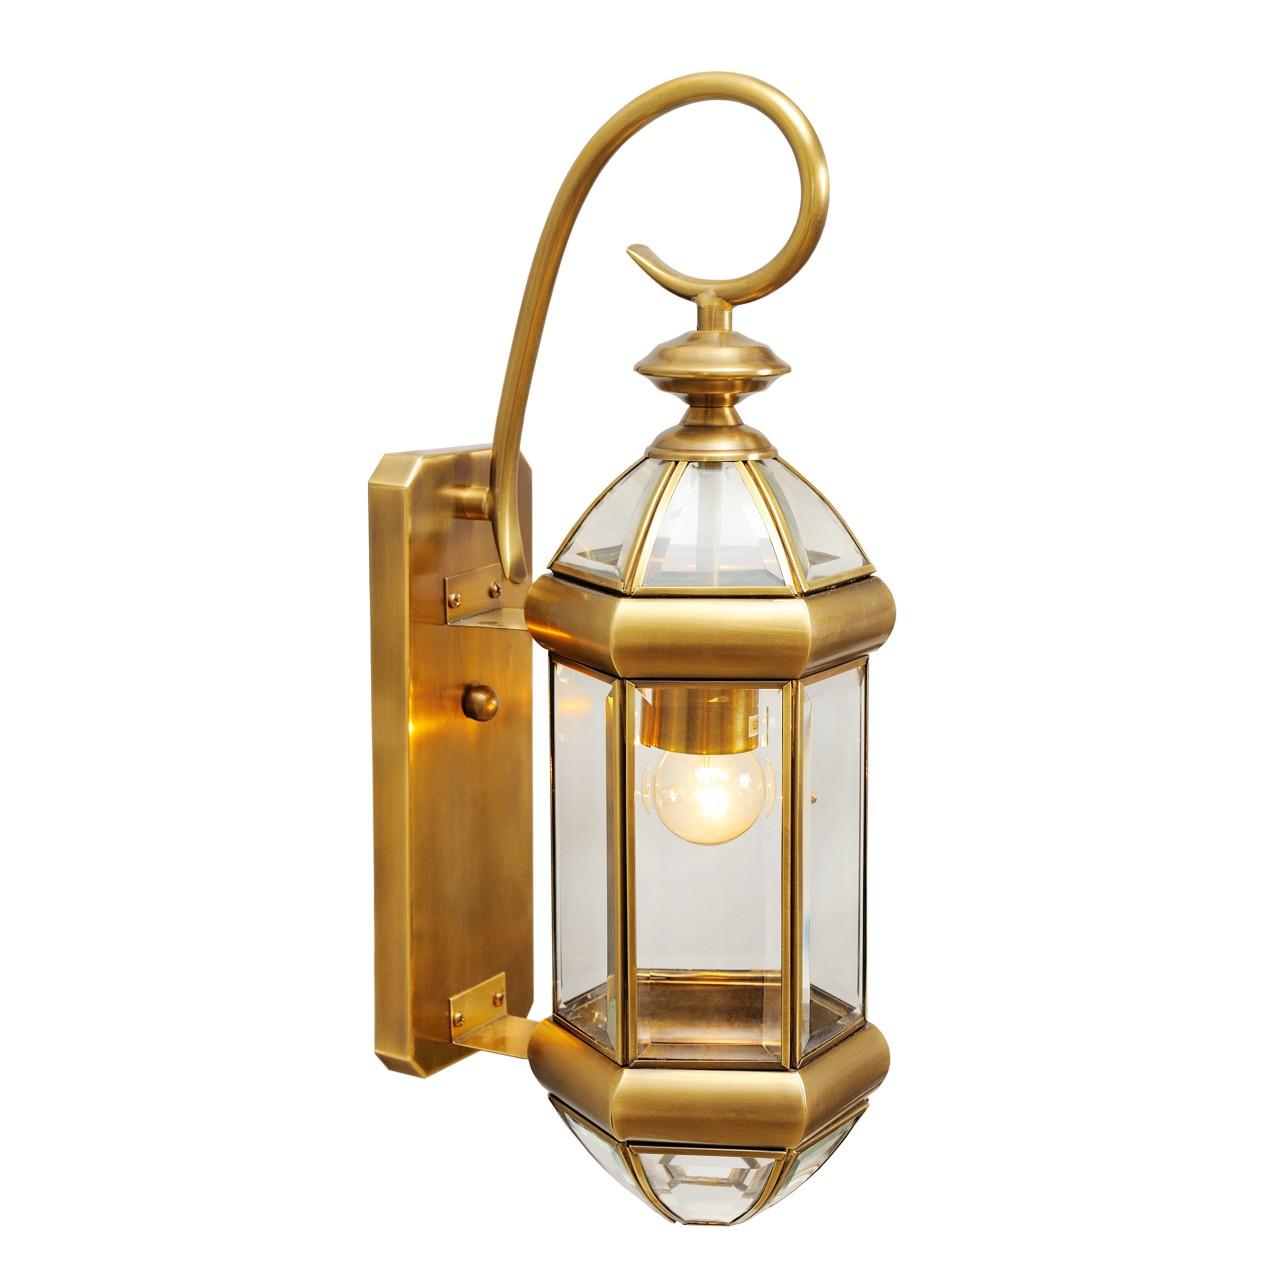 Уличный светильник Chiaro 802020401